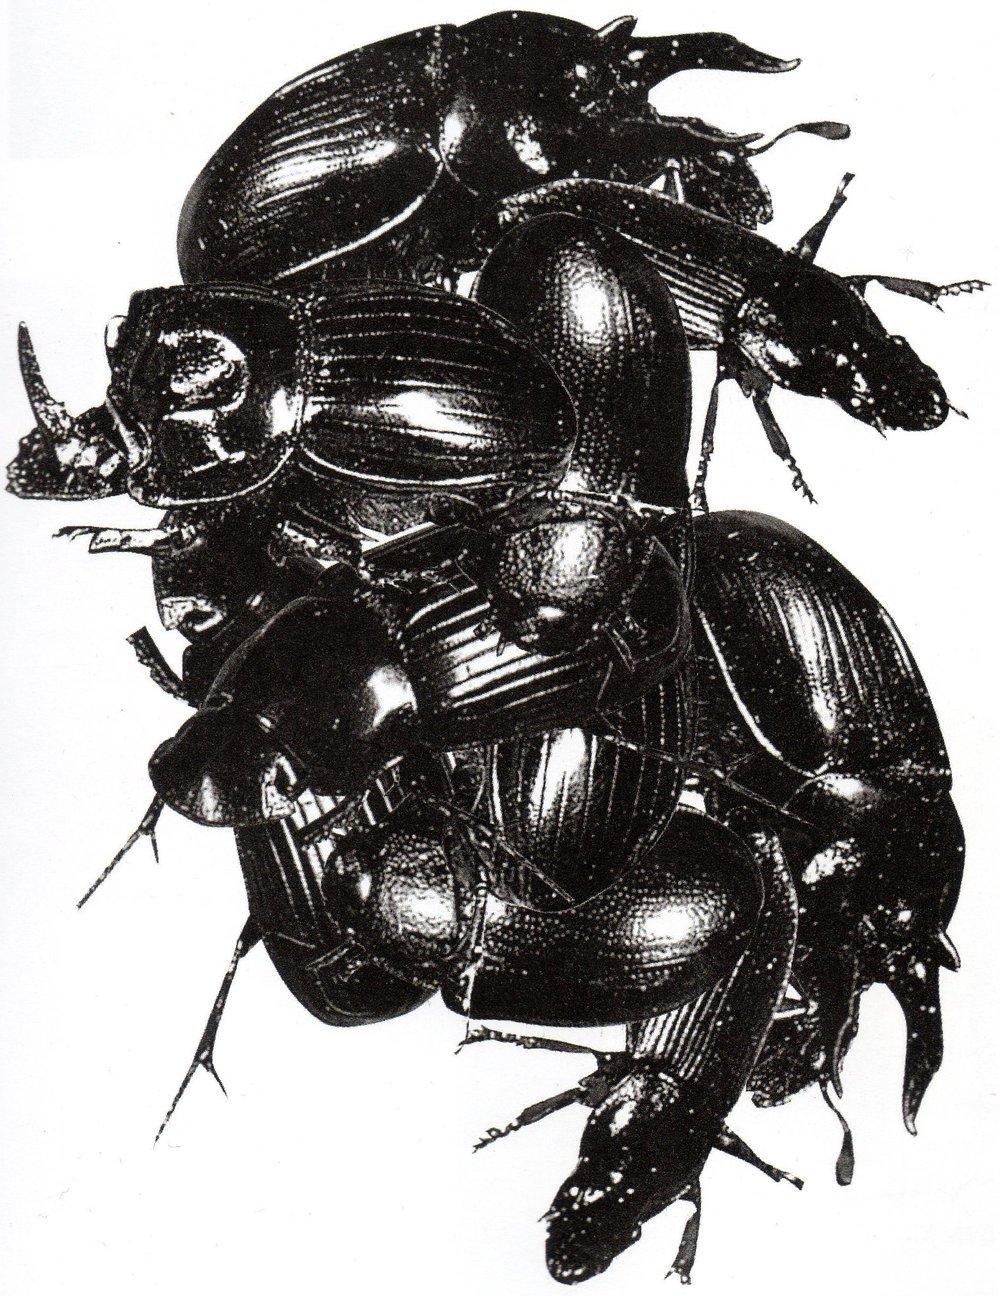 Early design sketch of the album artwork of Mezzanine.